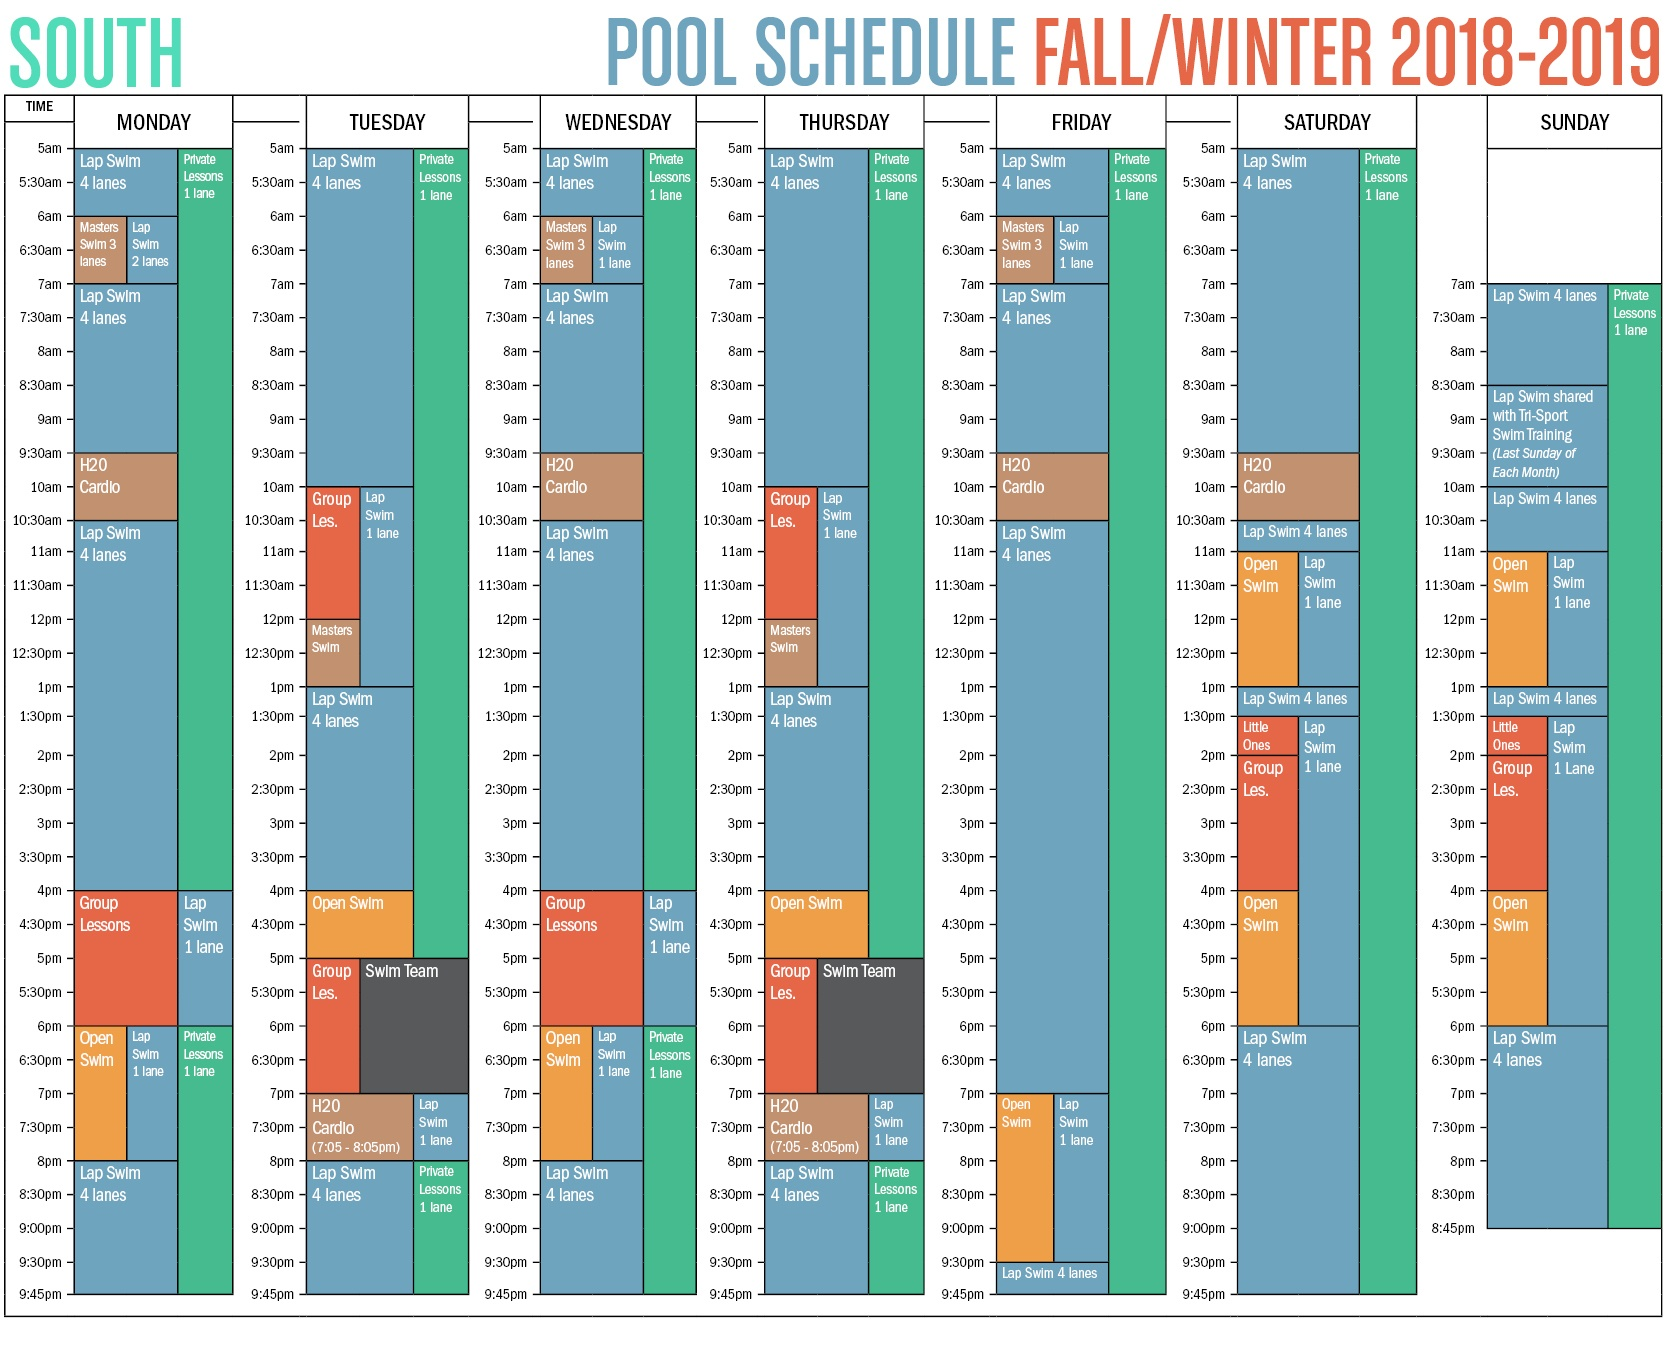 Q3-4-FallWinter-PoolSchedule-South